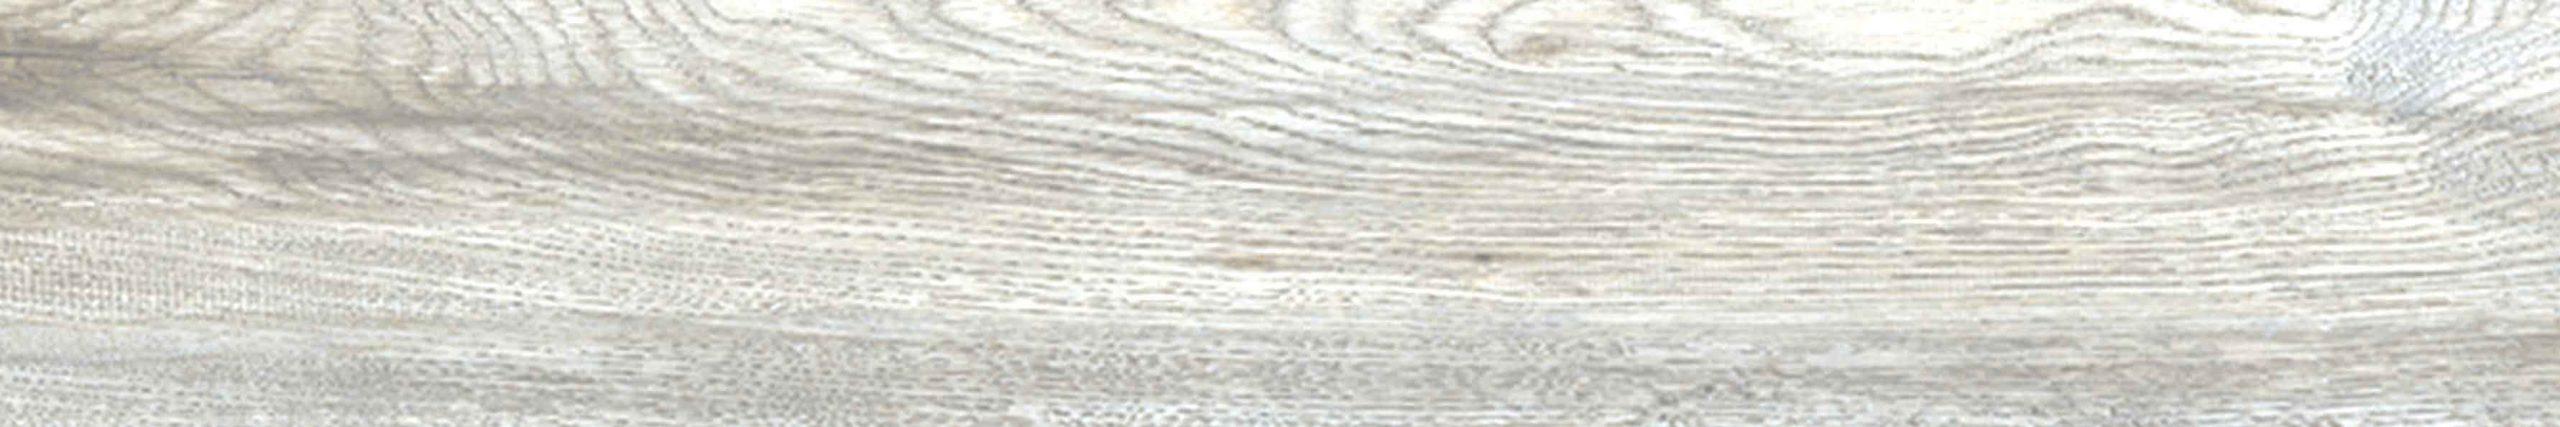 Details Wood White Matte 10mm 20 x 120